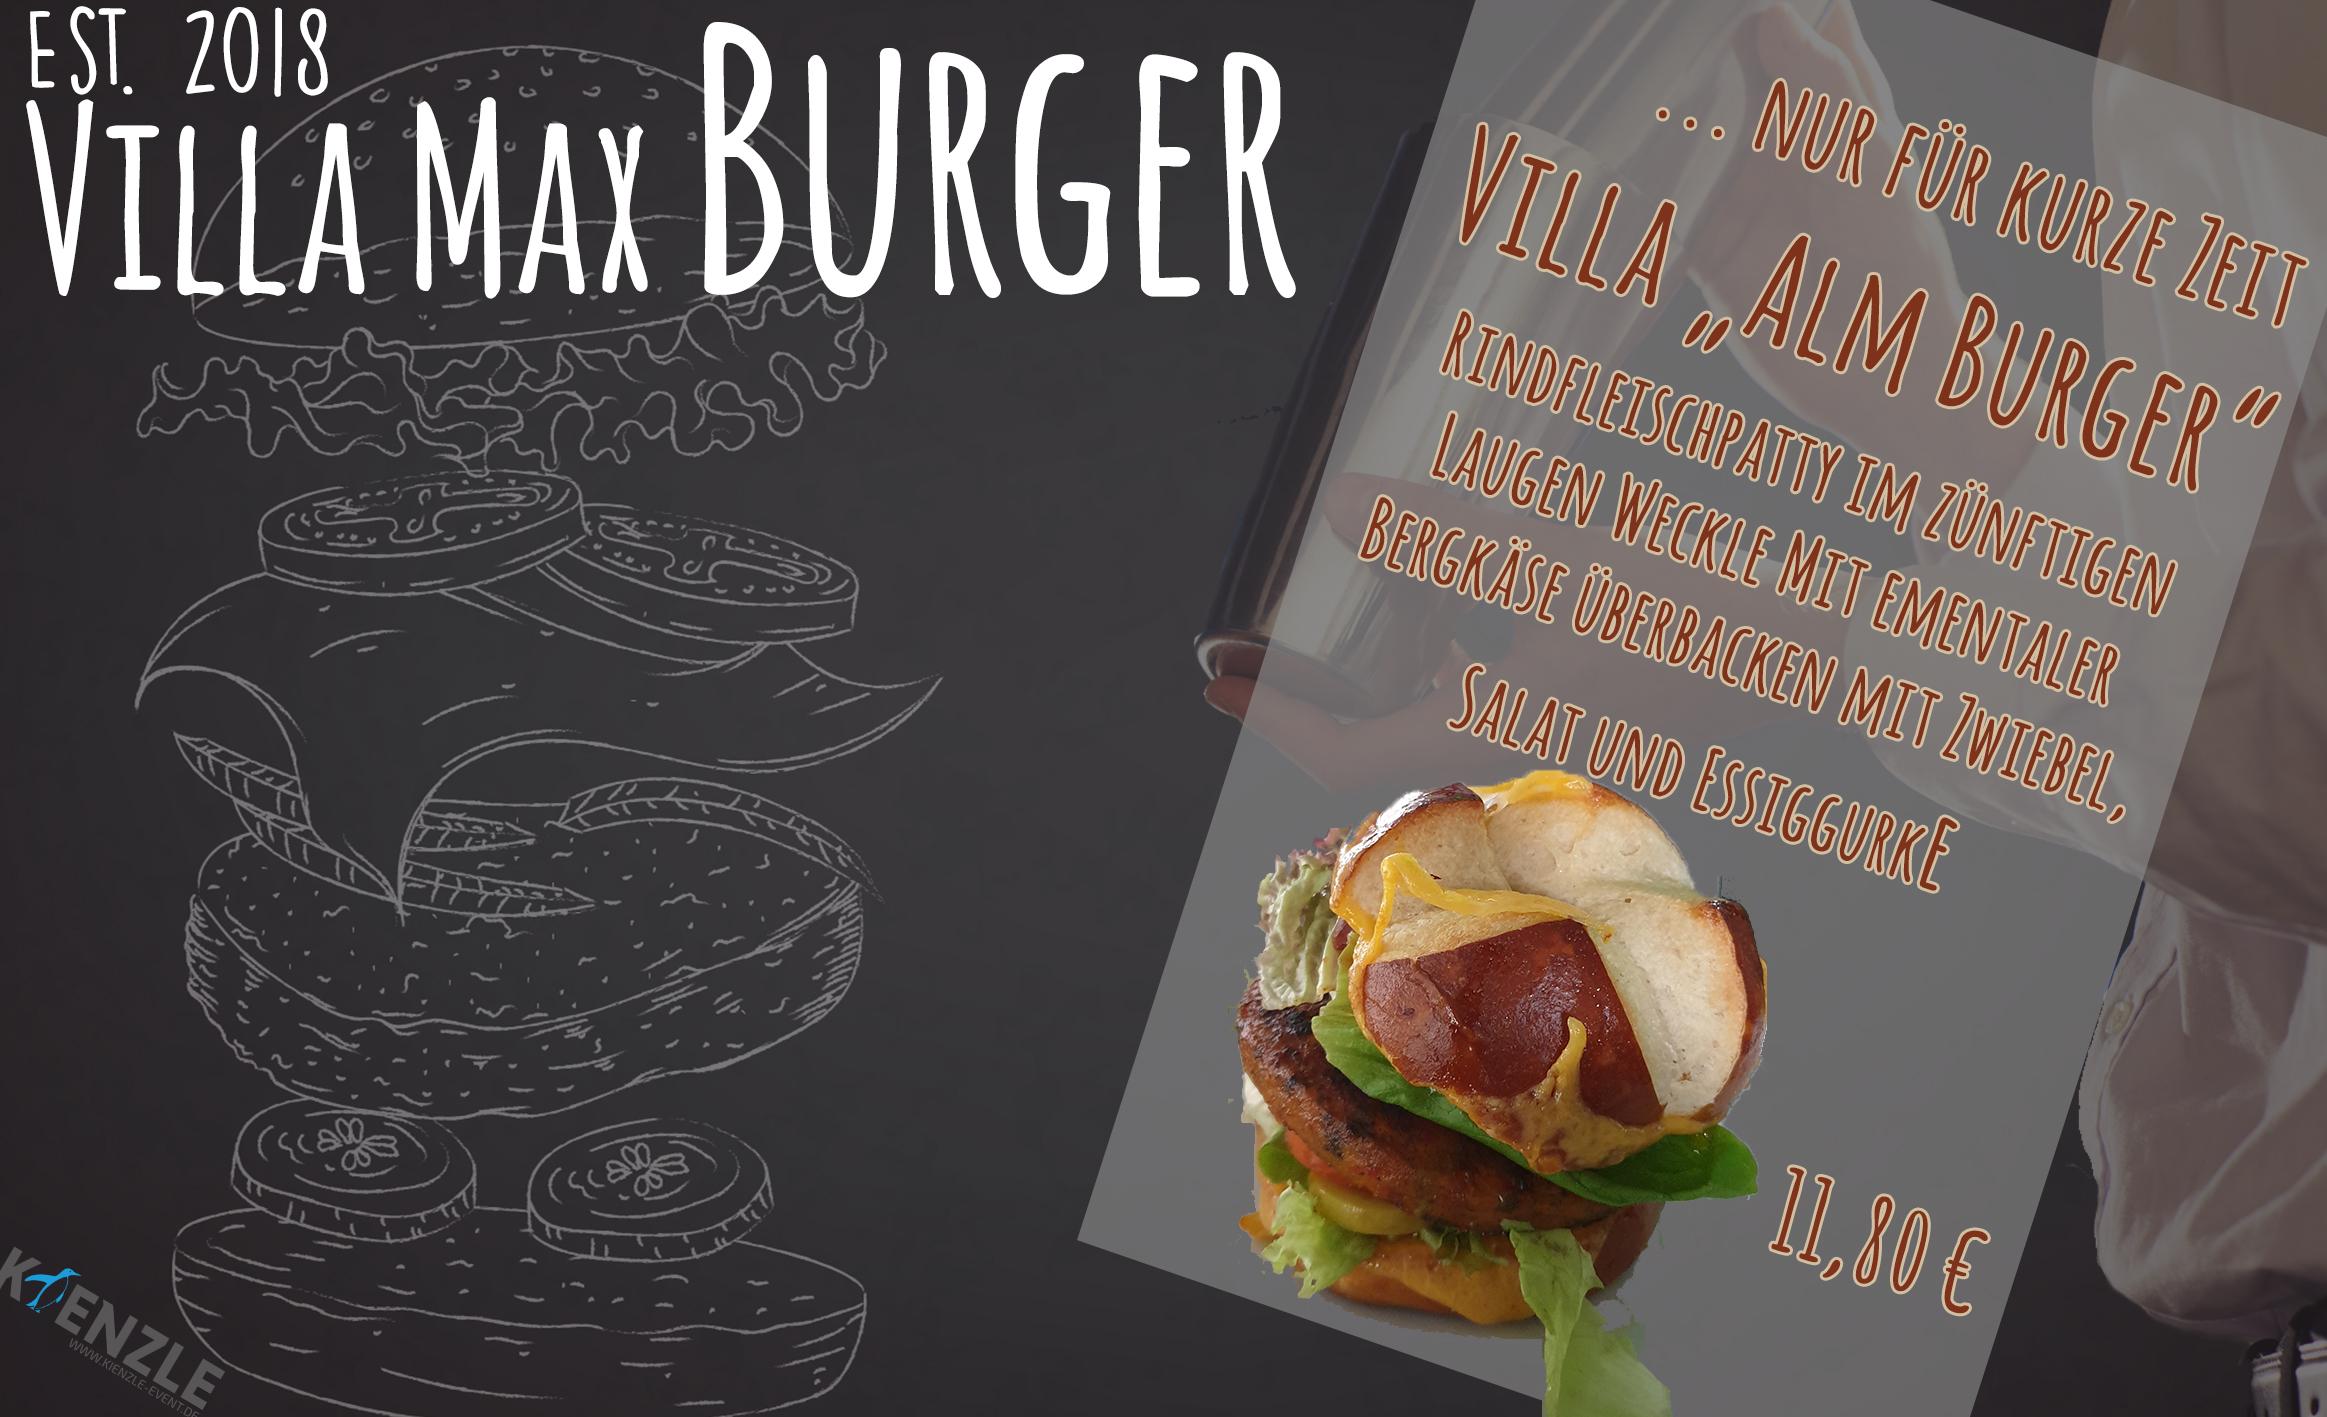 Alm Burger